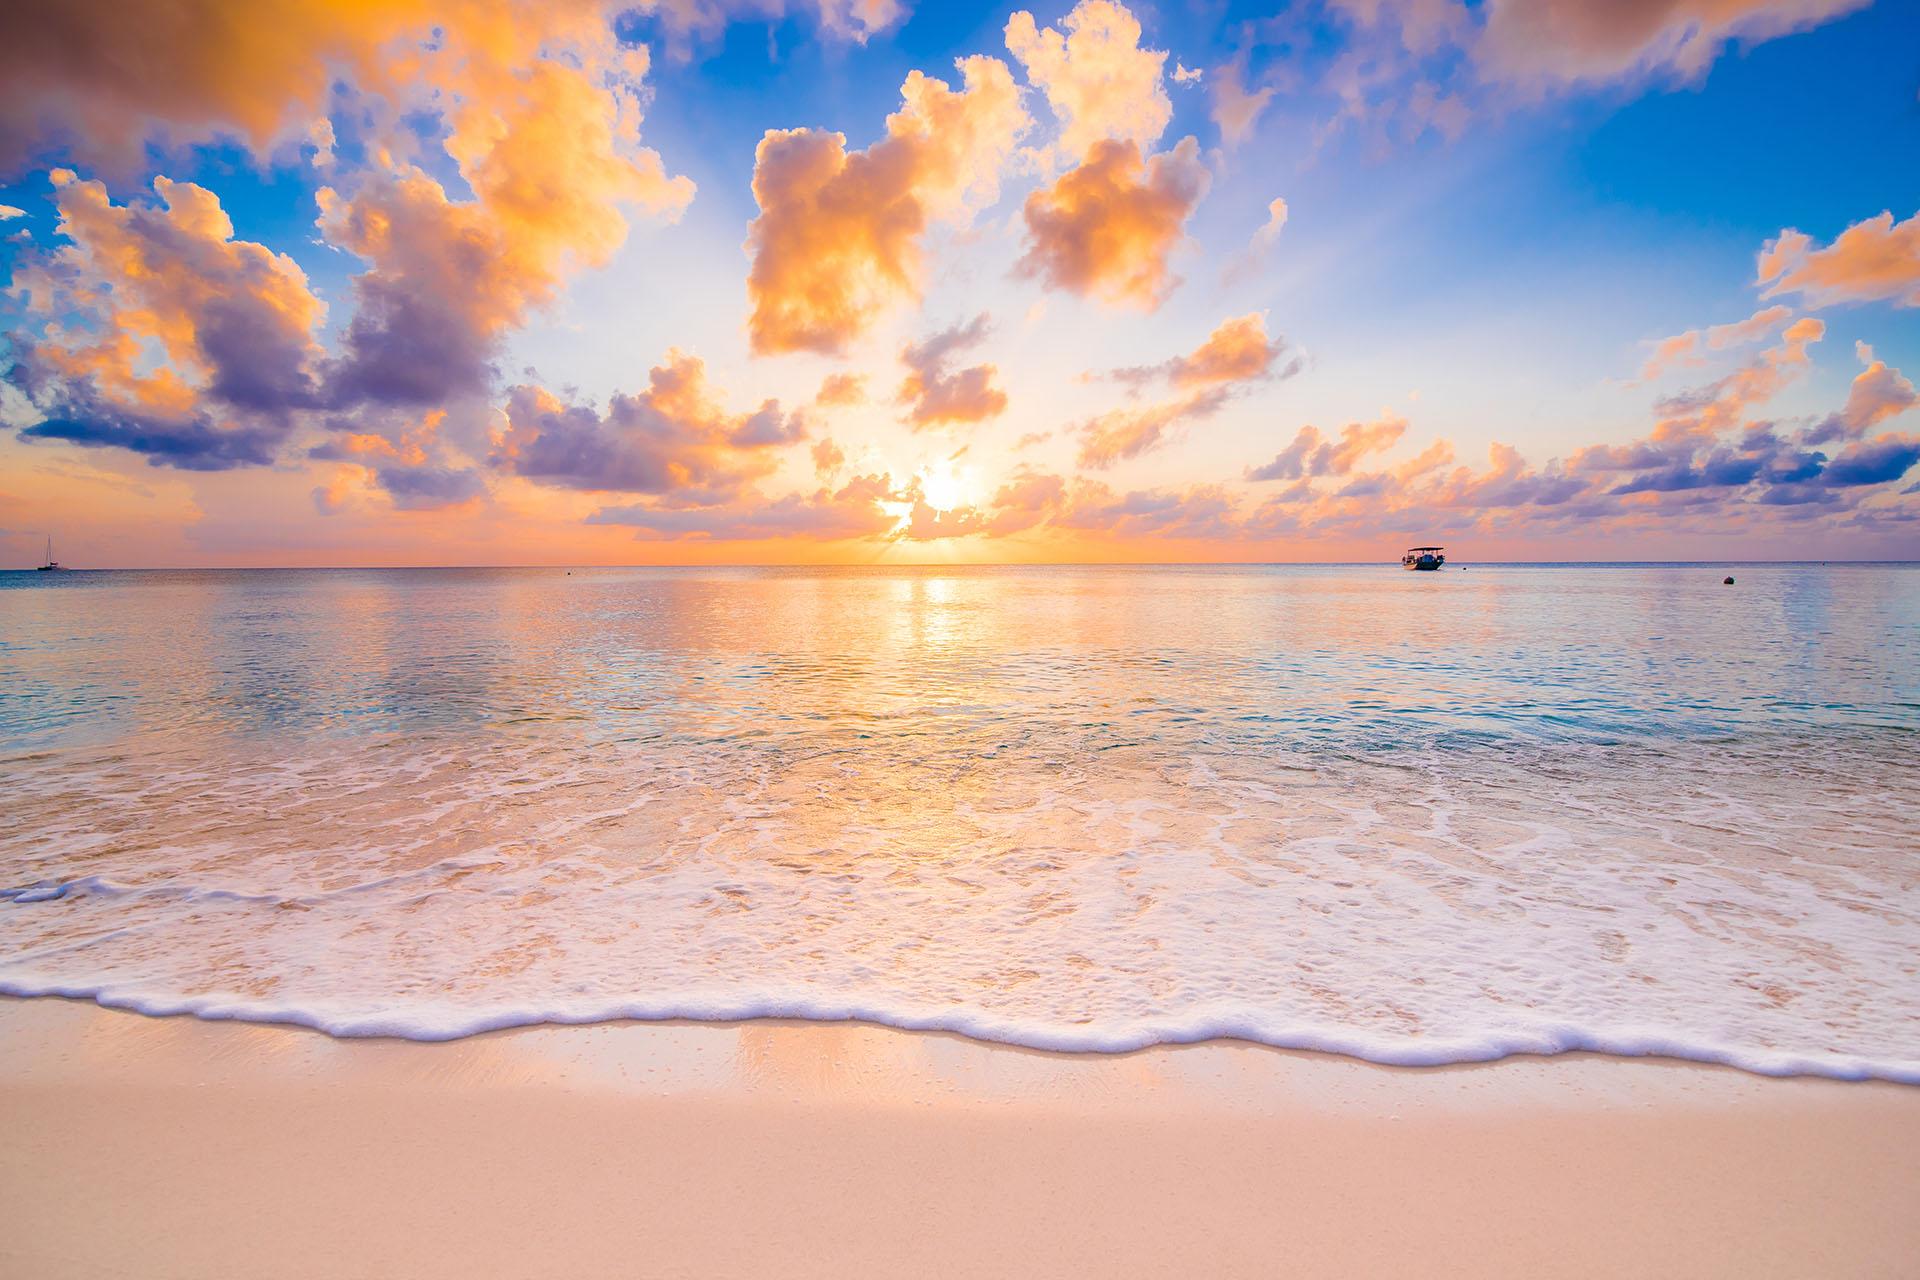 grand cayman photographer wall art www.irenecorti.com